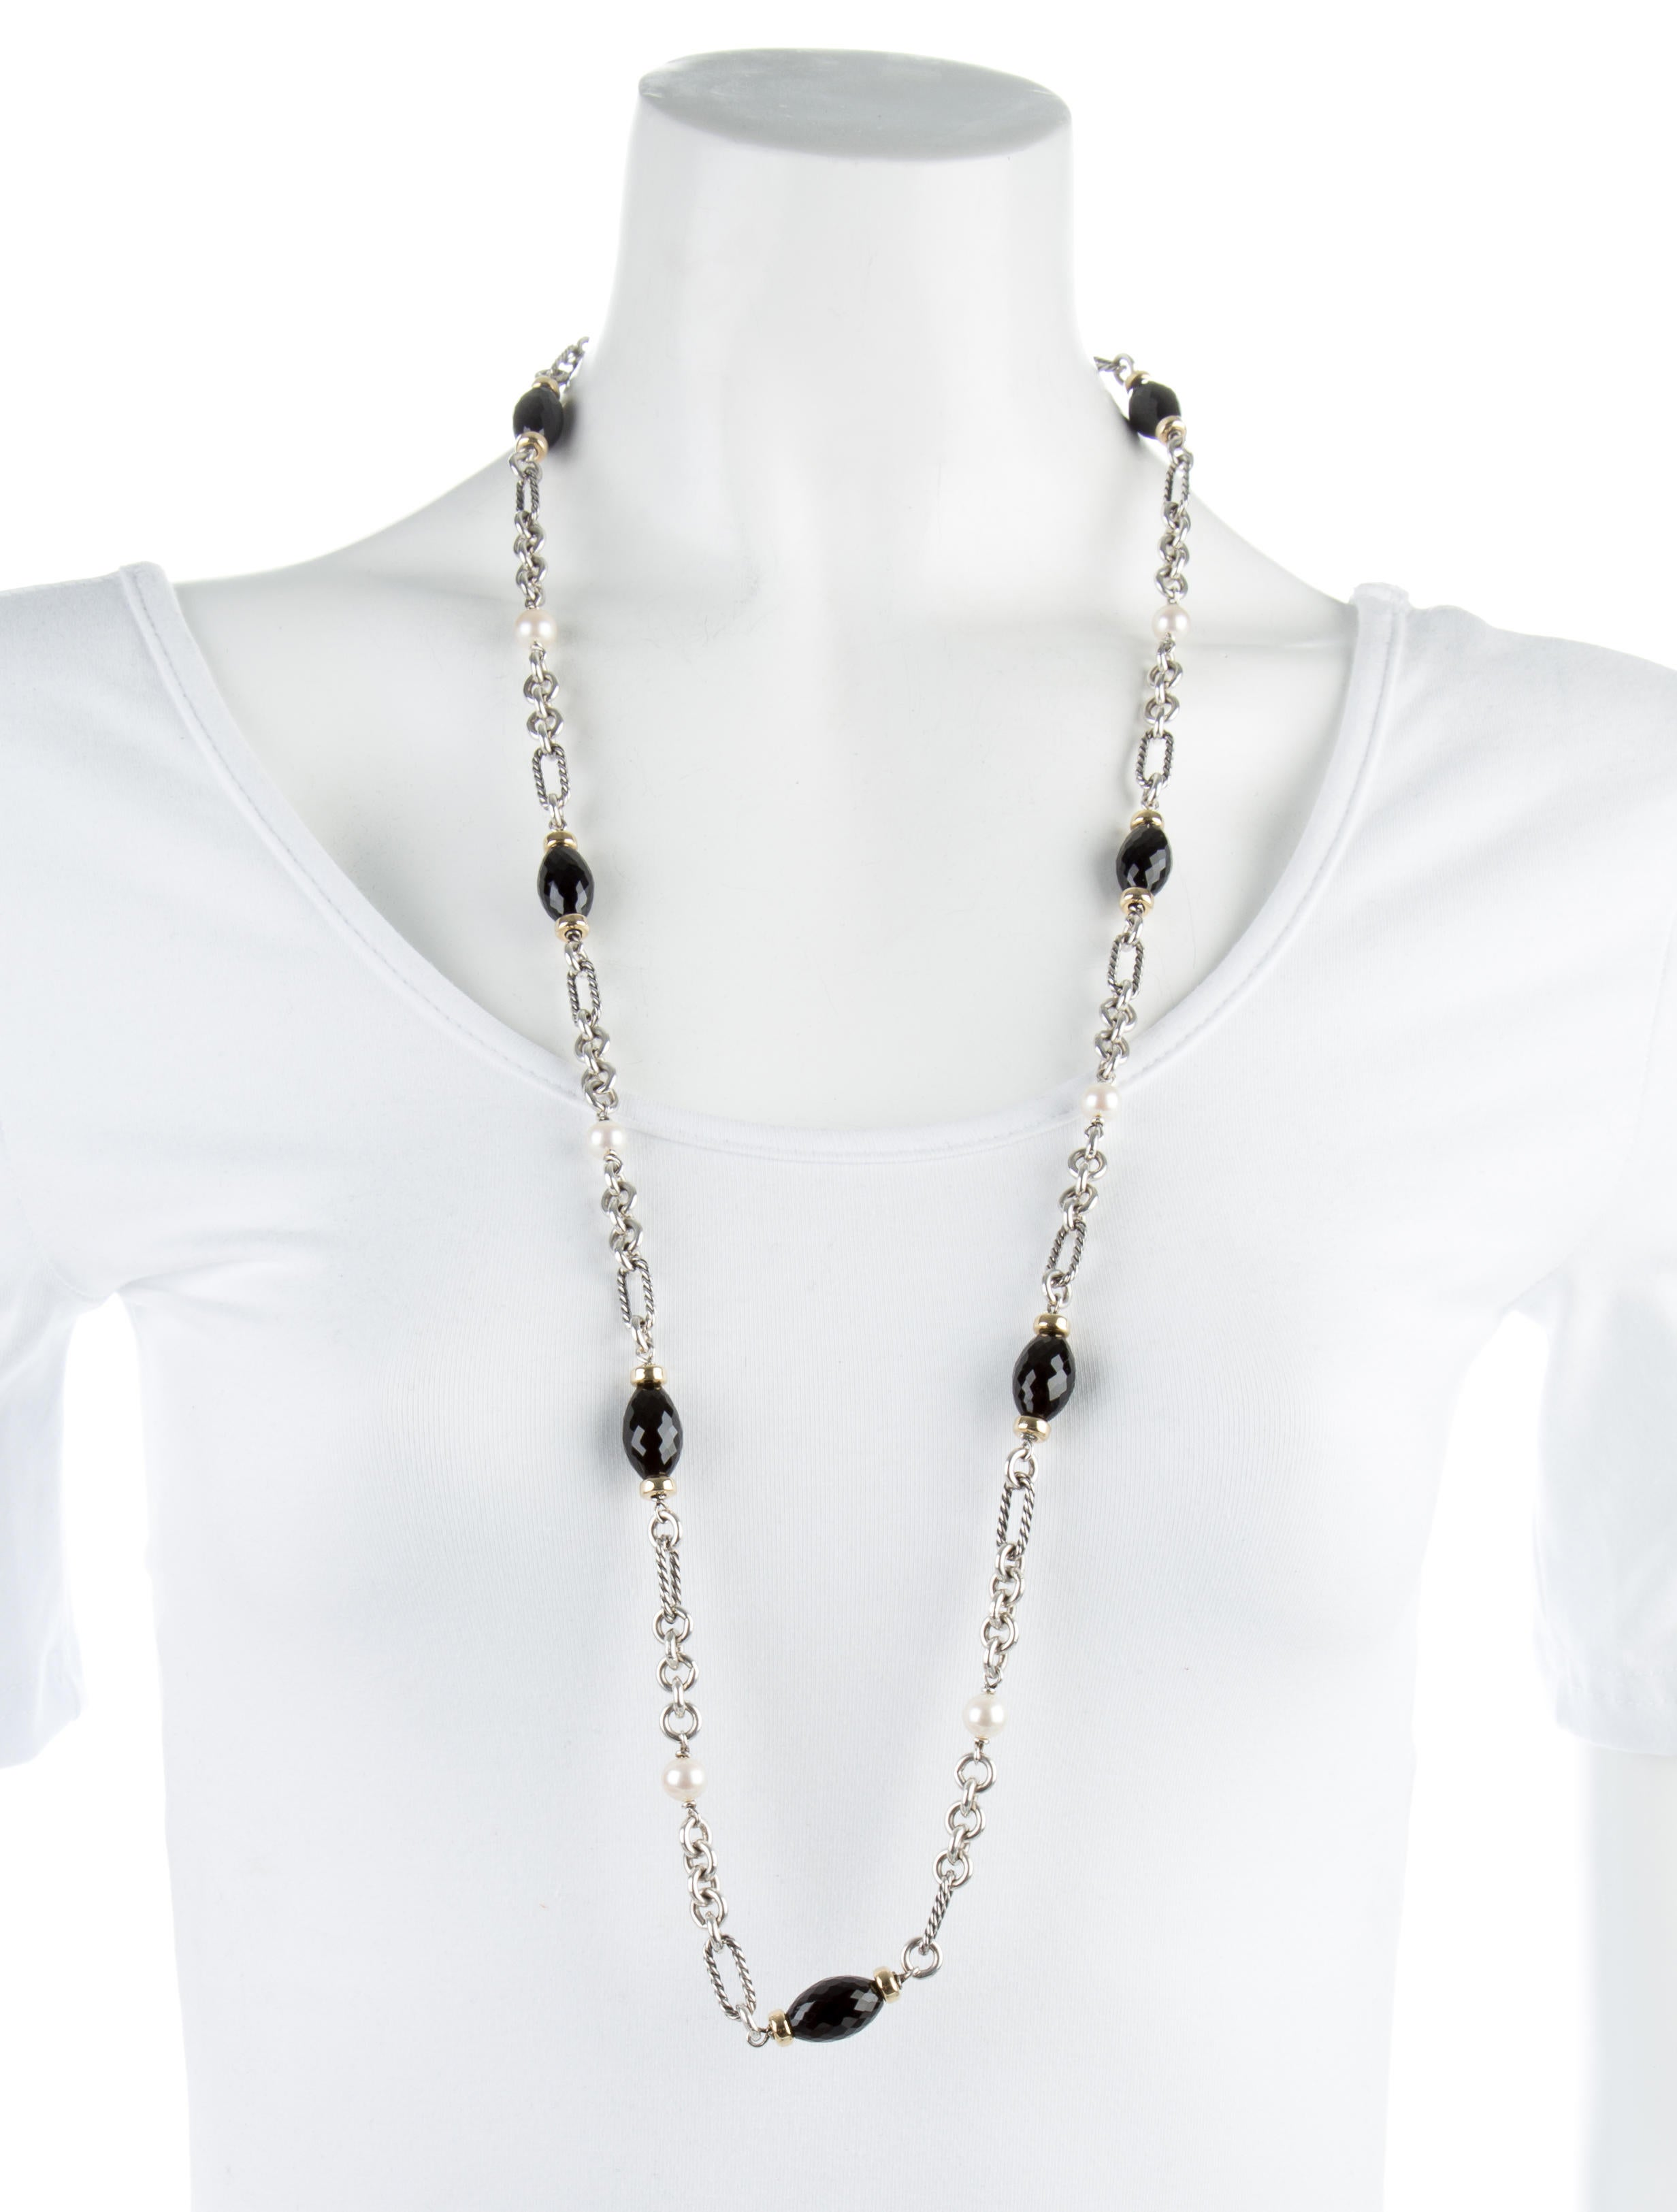 David Yurman Pearl Amp Onyx Figaro Necklace Necklaces